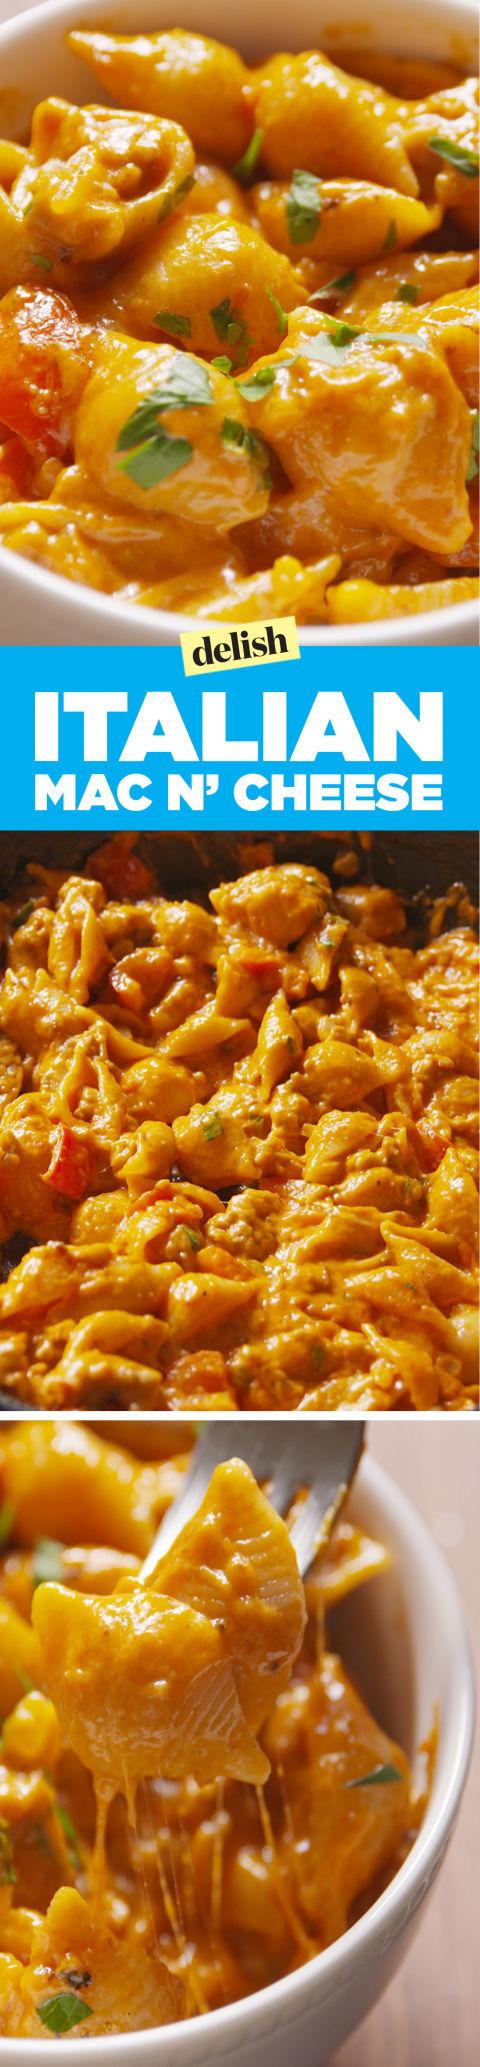 Best Italian Mac Amp Cheese Recipe How To Make Italian Mac